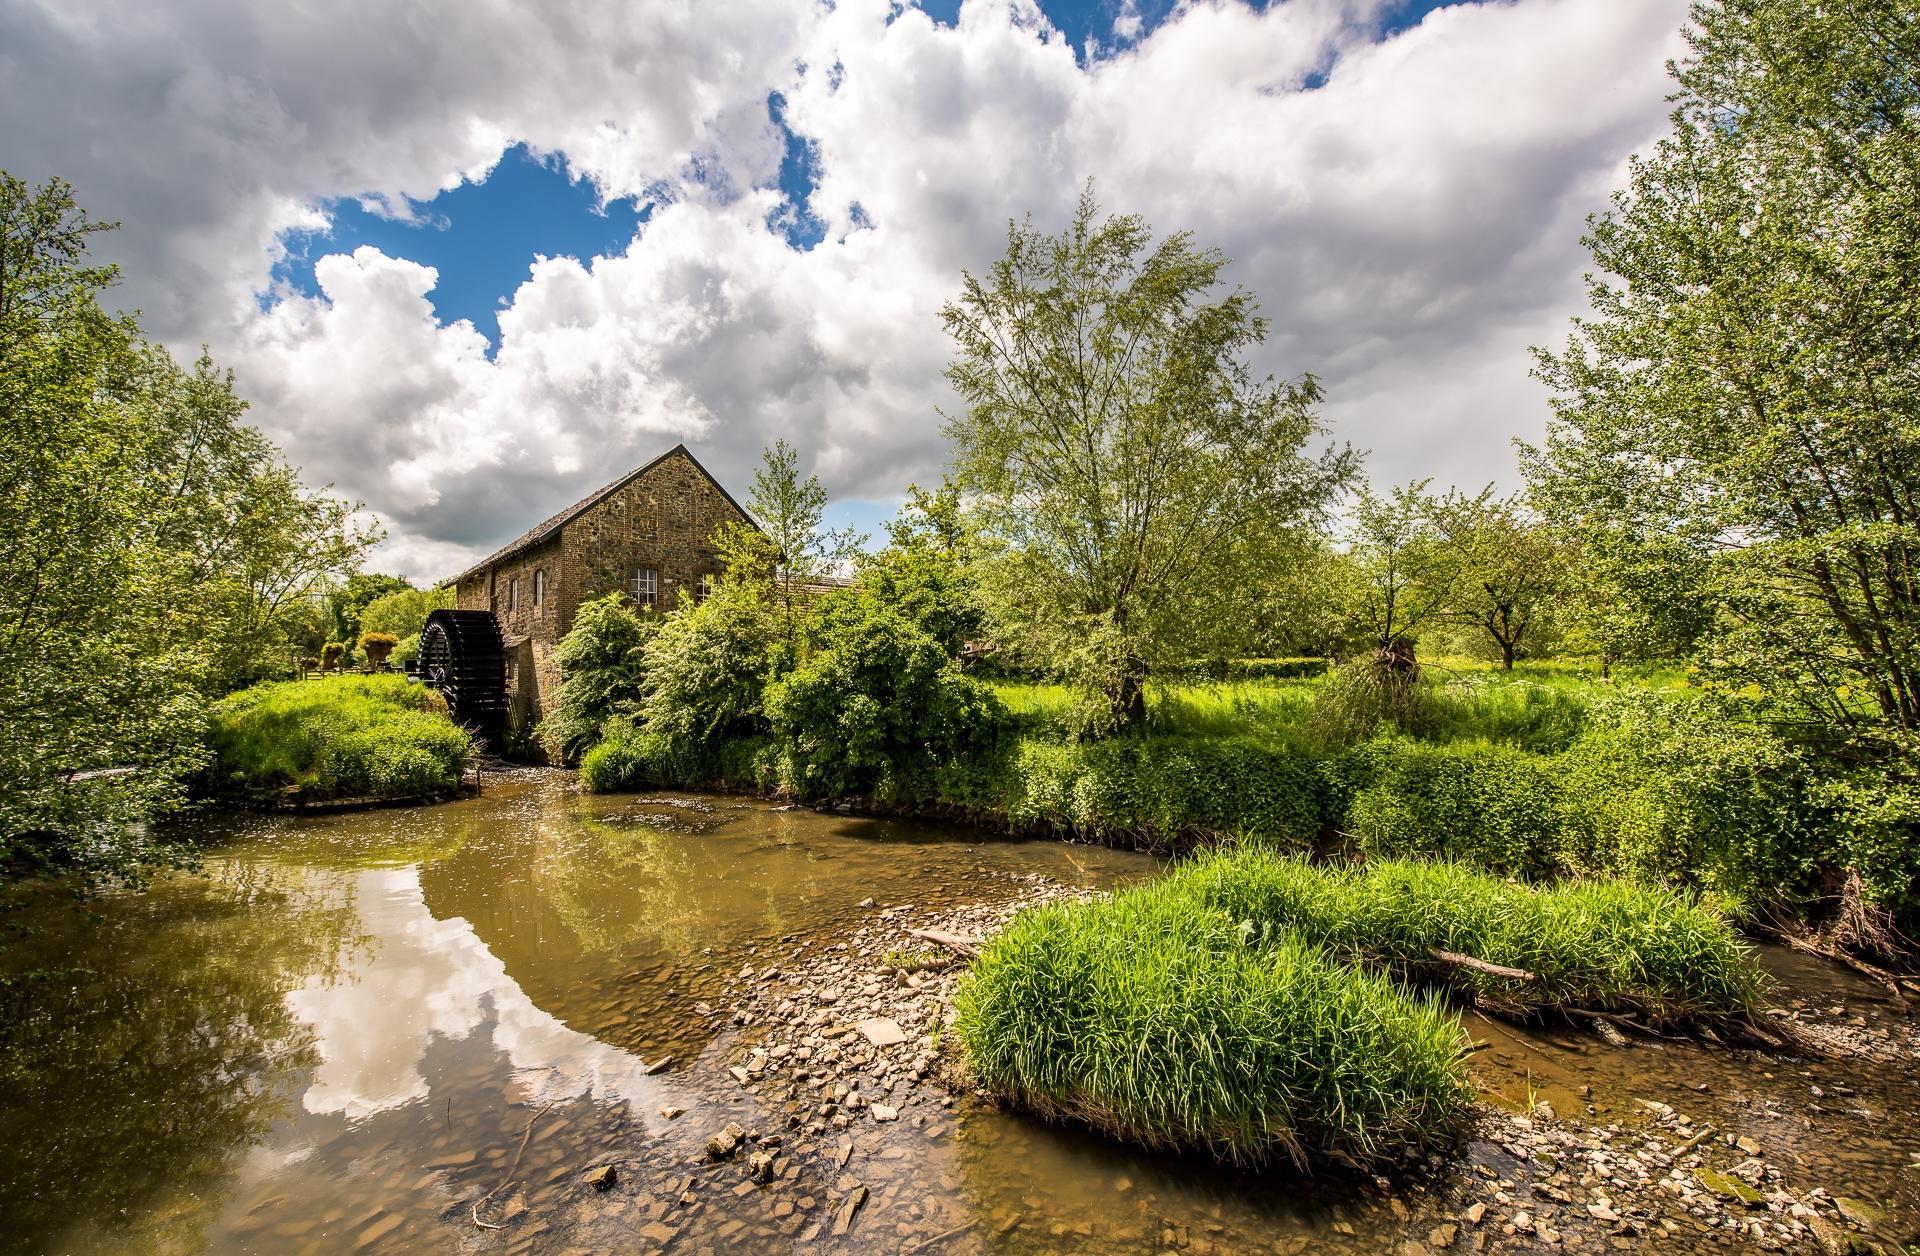 Обои Лимбург, Нидерланды, водяная мельница, река